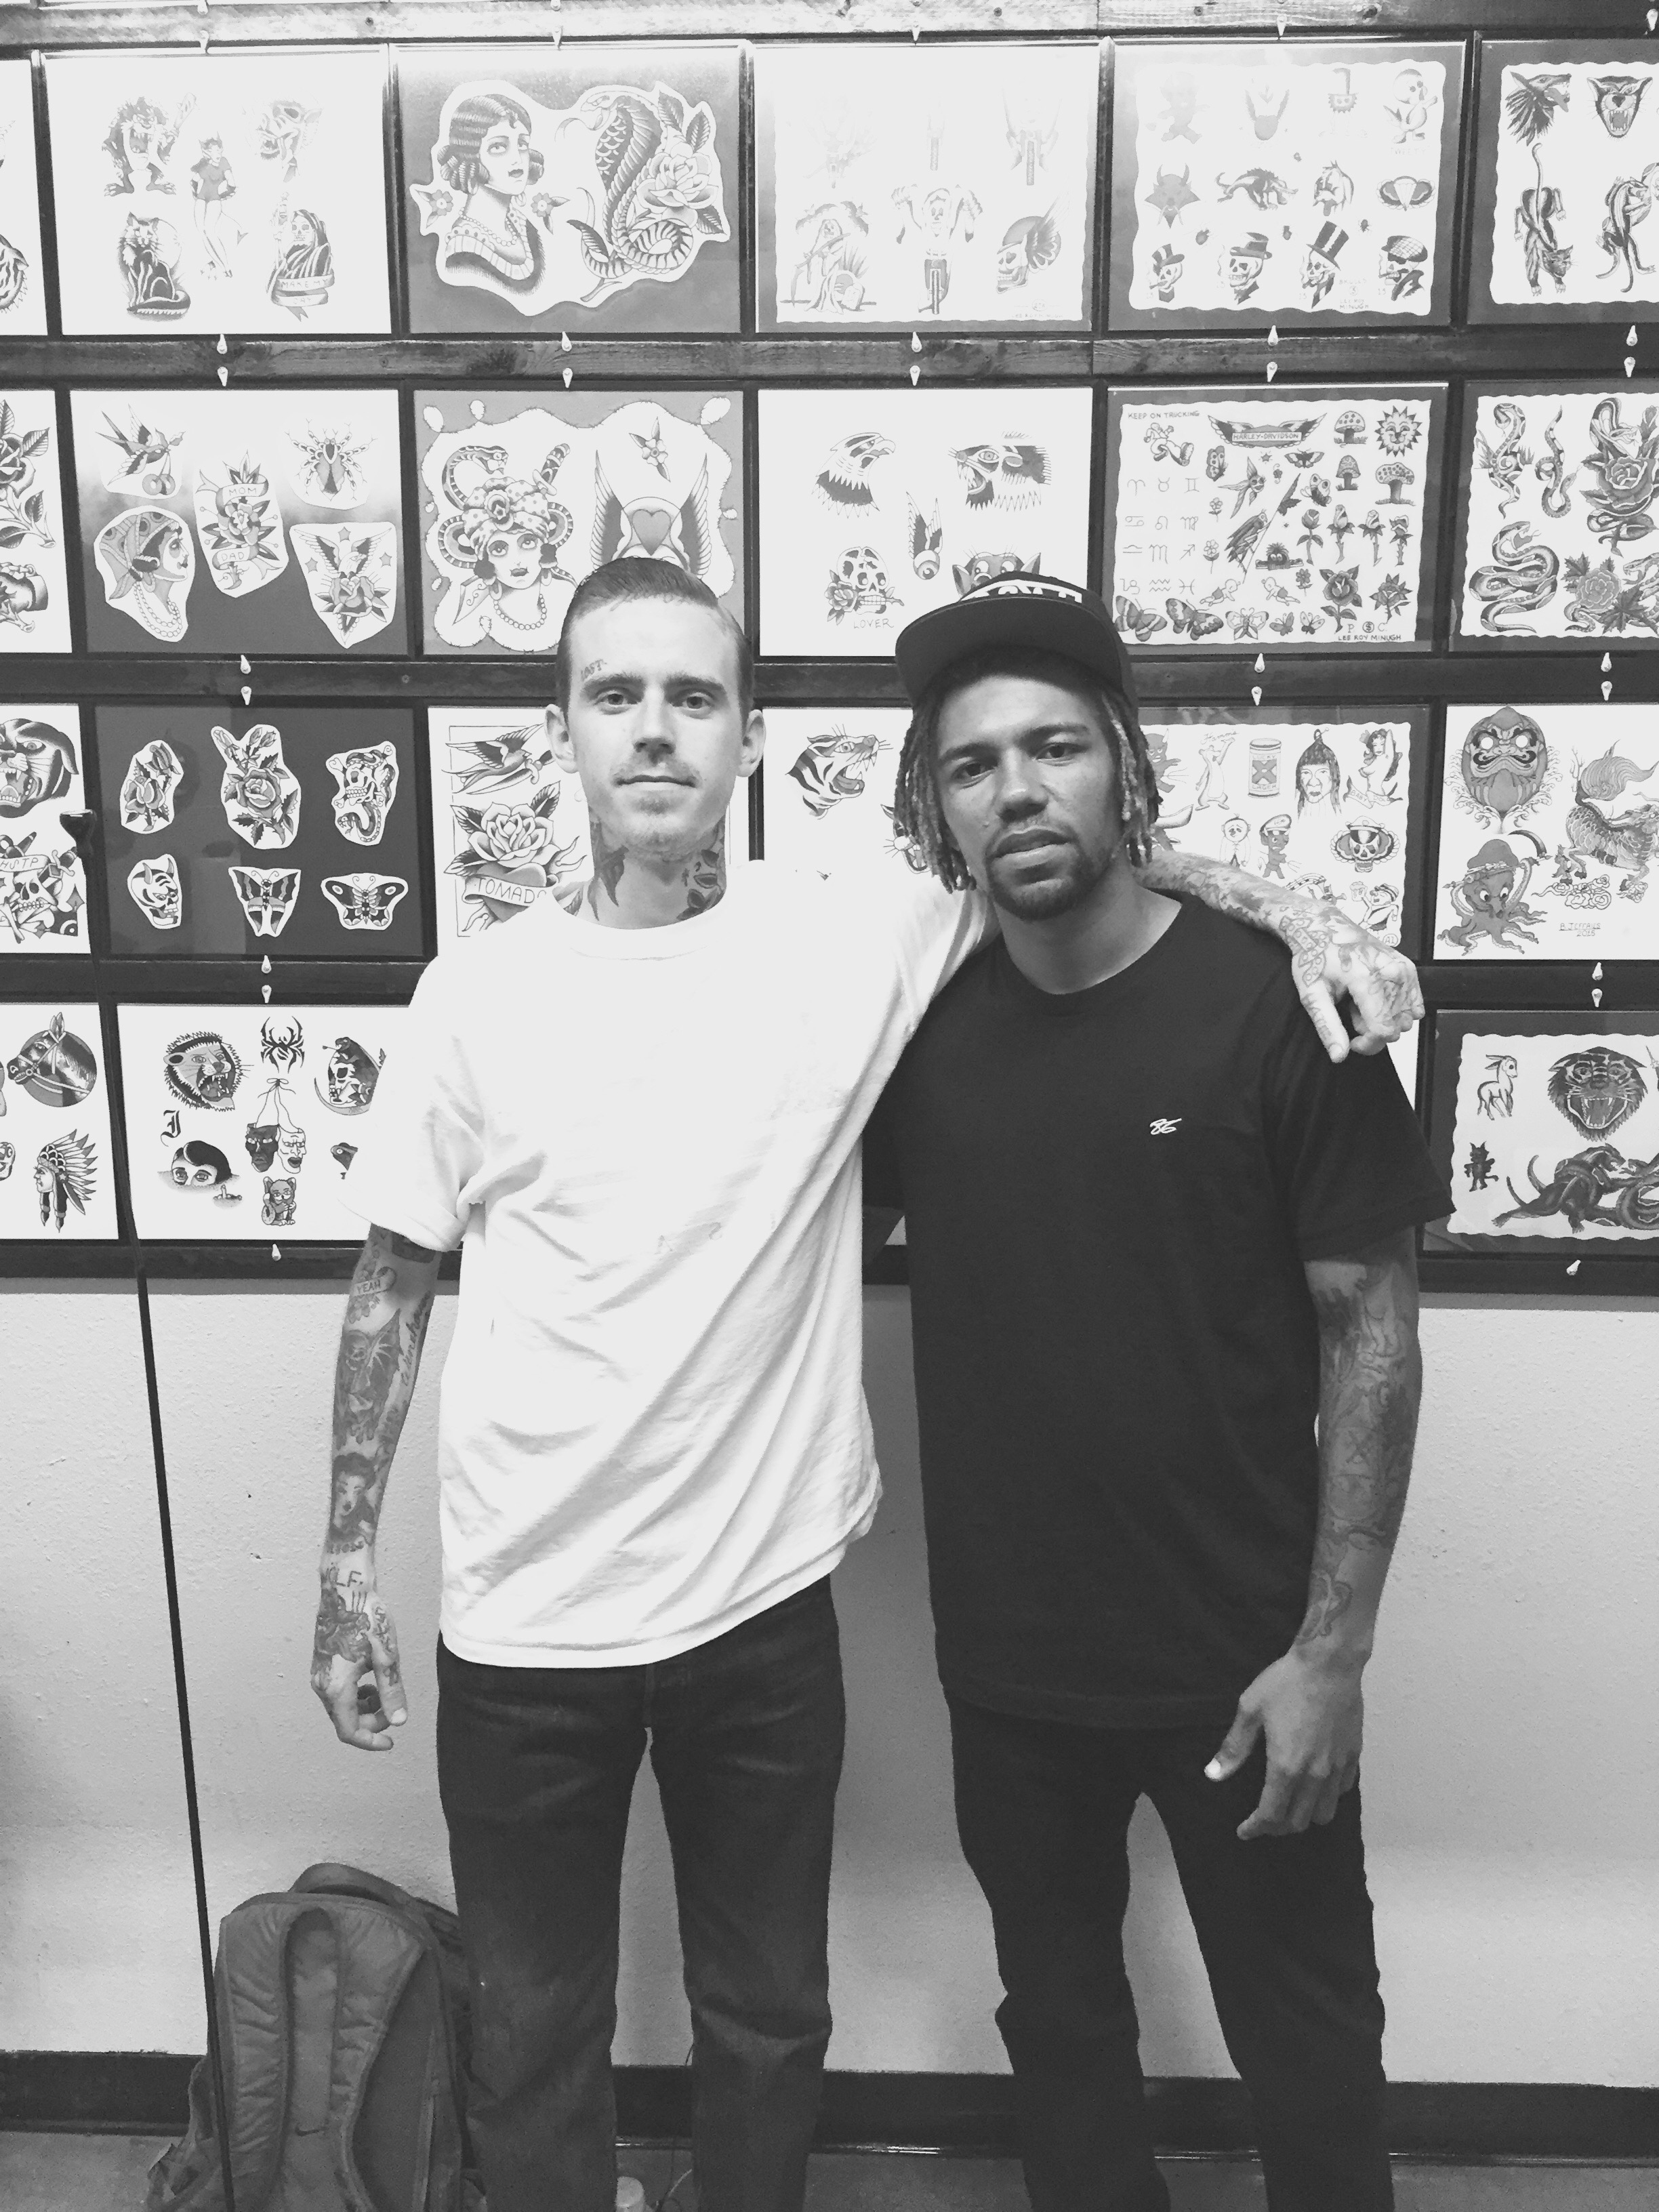 Jeff Sypherd & Joon @ Mission Tattoo in Riverside, CA | 05/13/2015